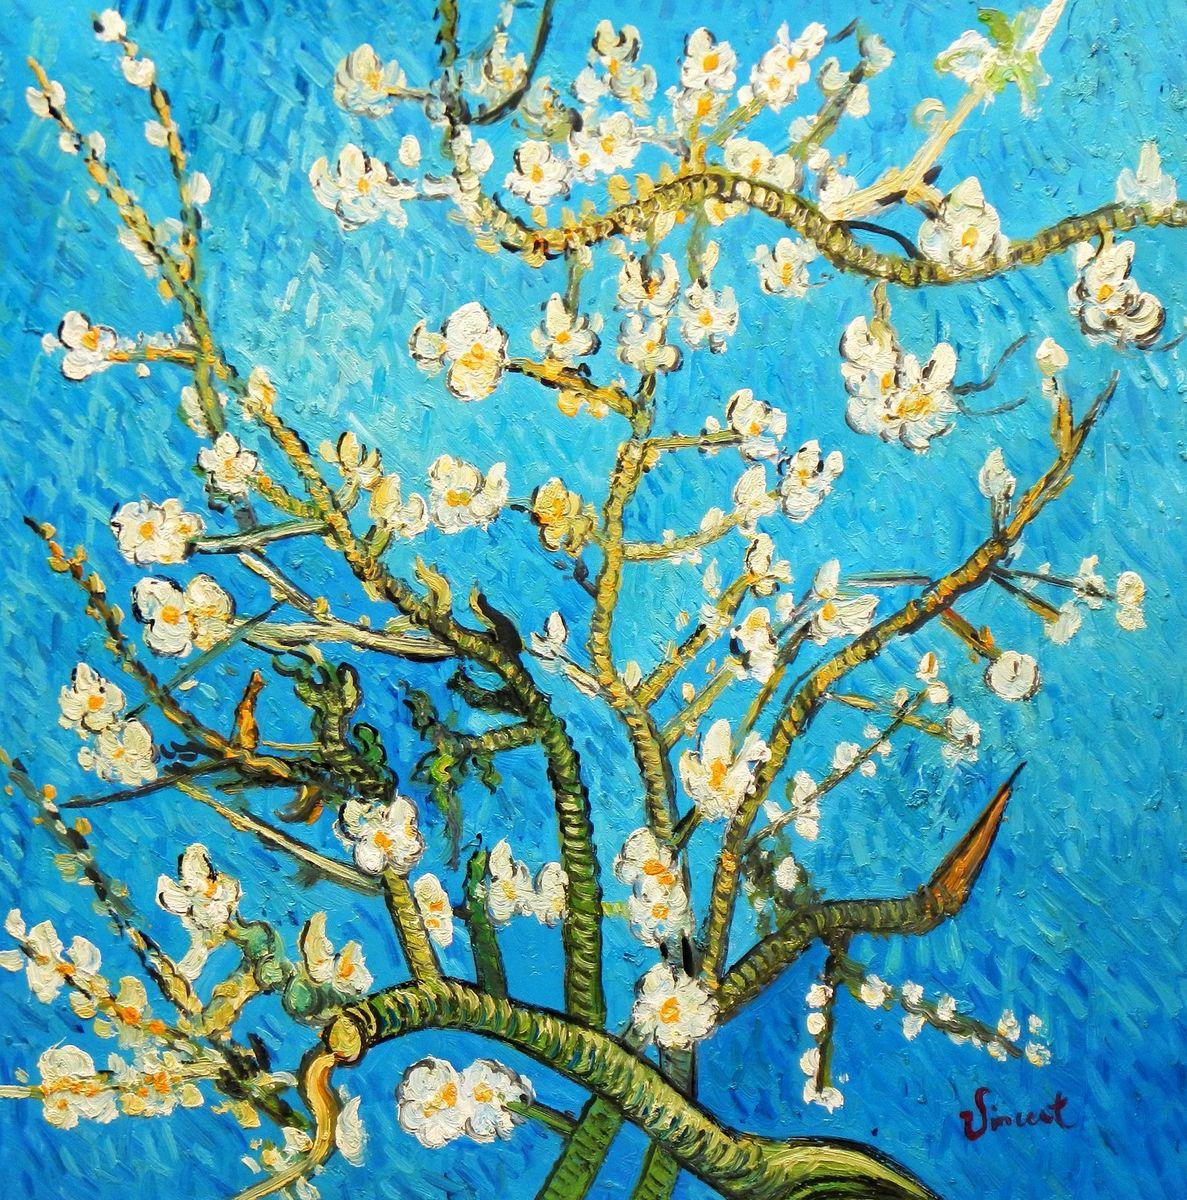 Vincent van Gogh - Äste mit Mandelblüten e96067 60x60cm Ölbild handgemalt